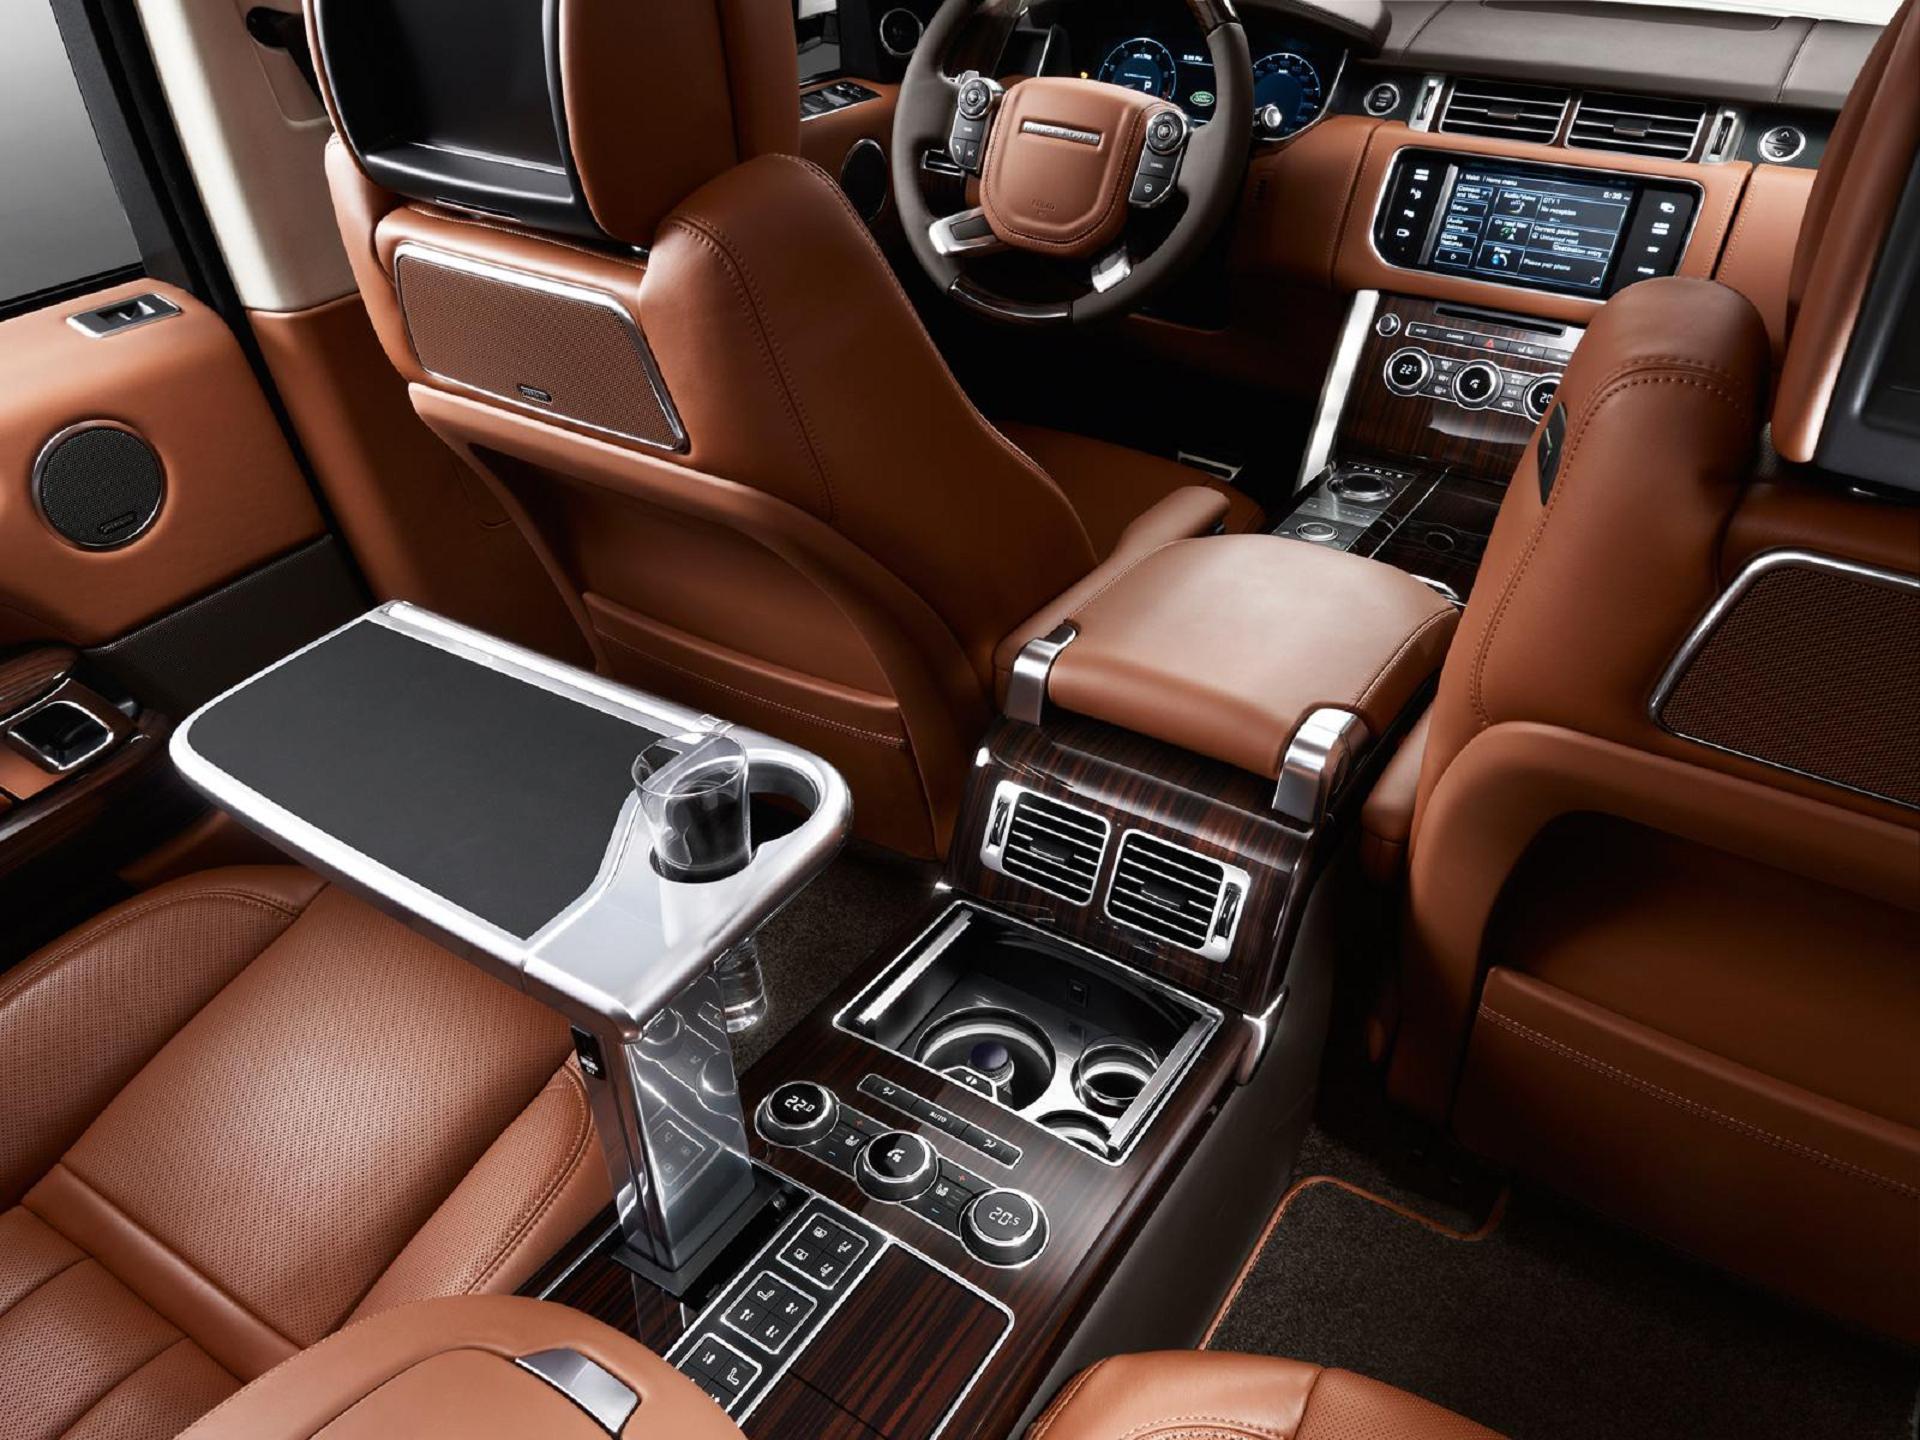 Range Rover Computer Backgrounds